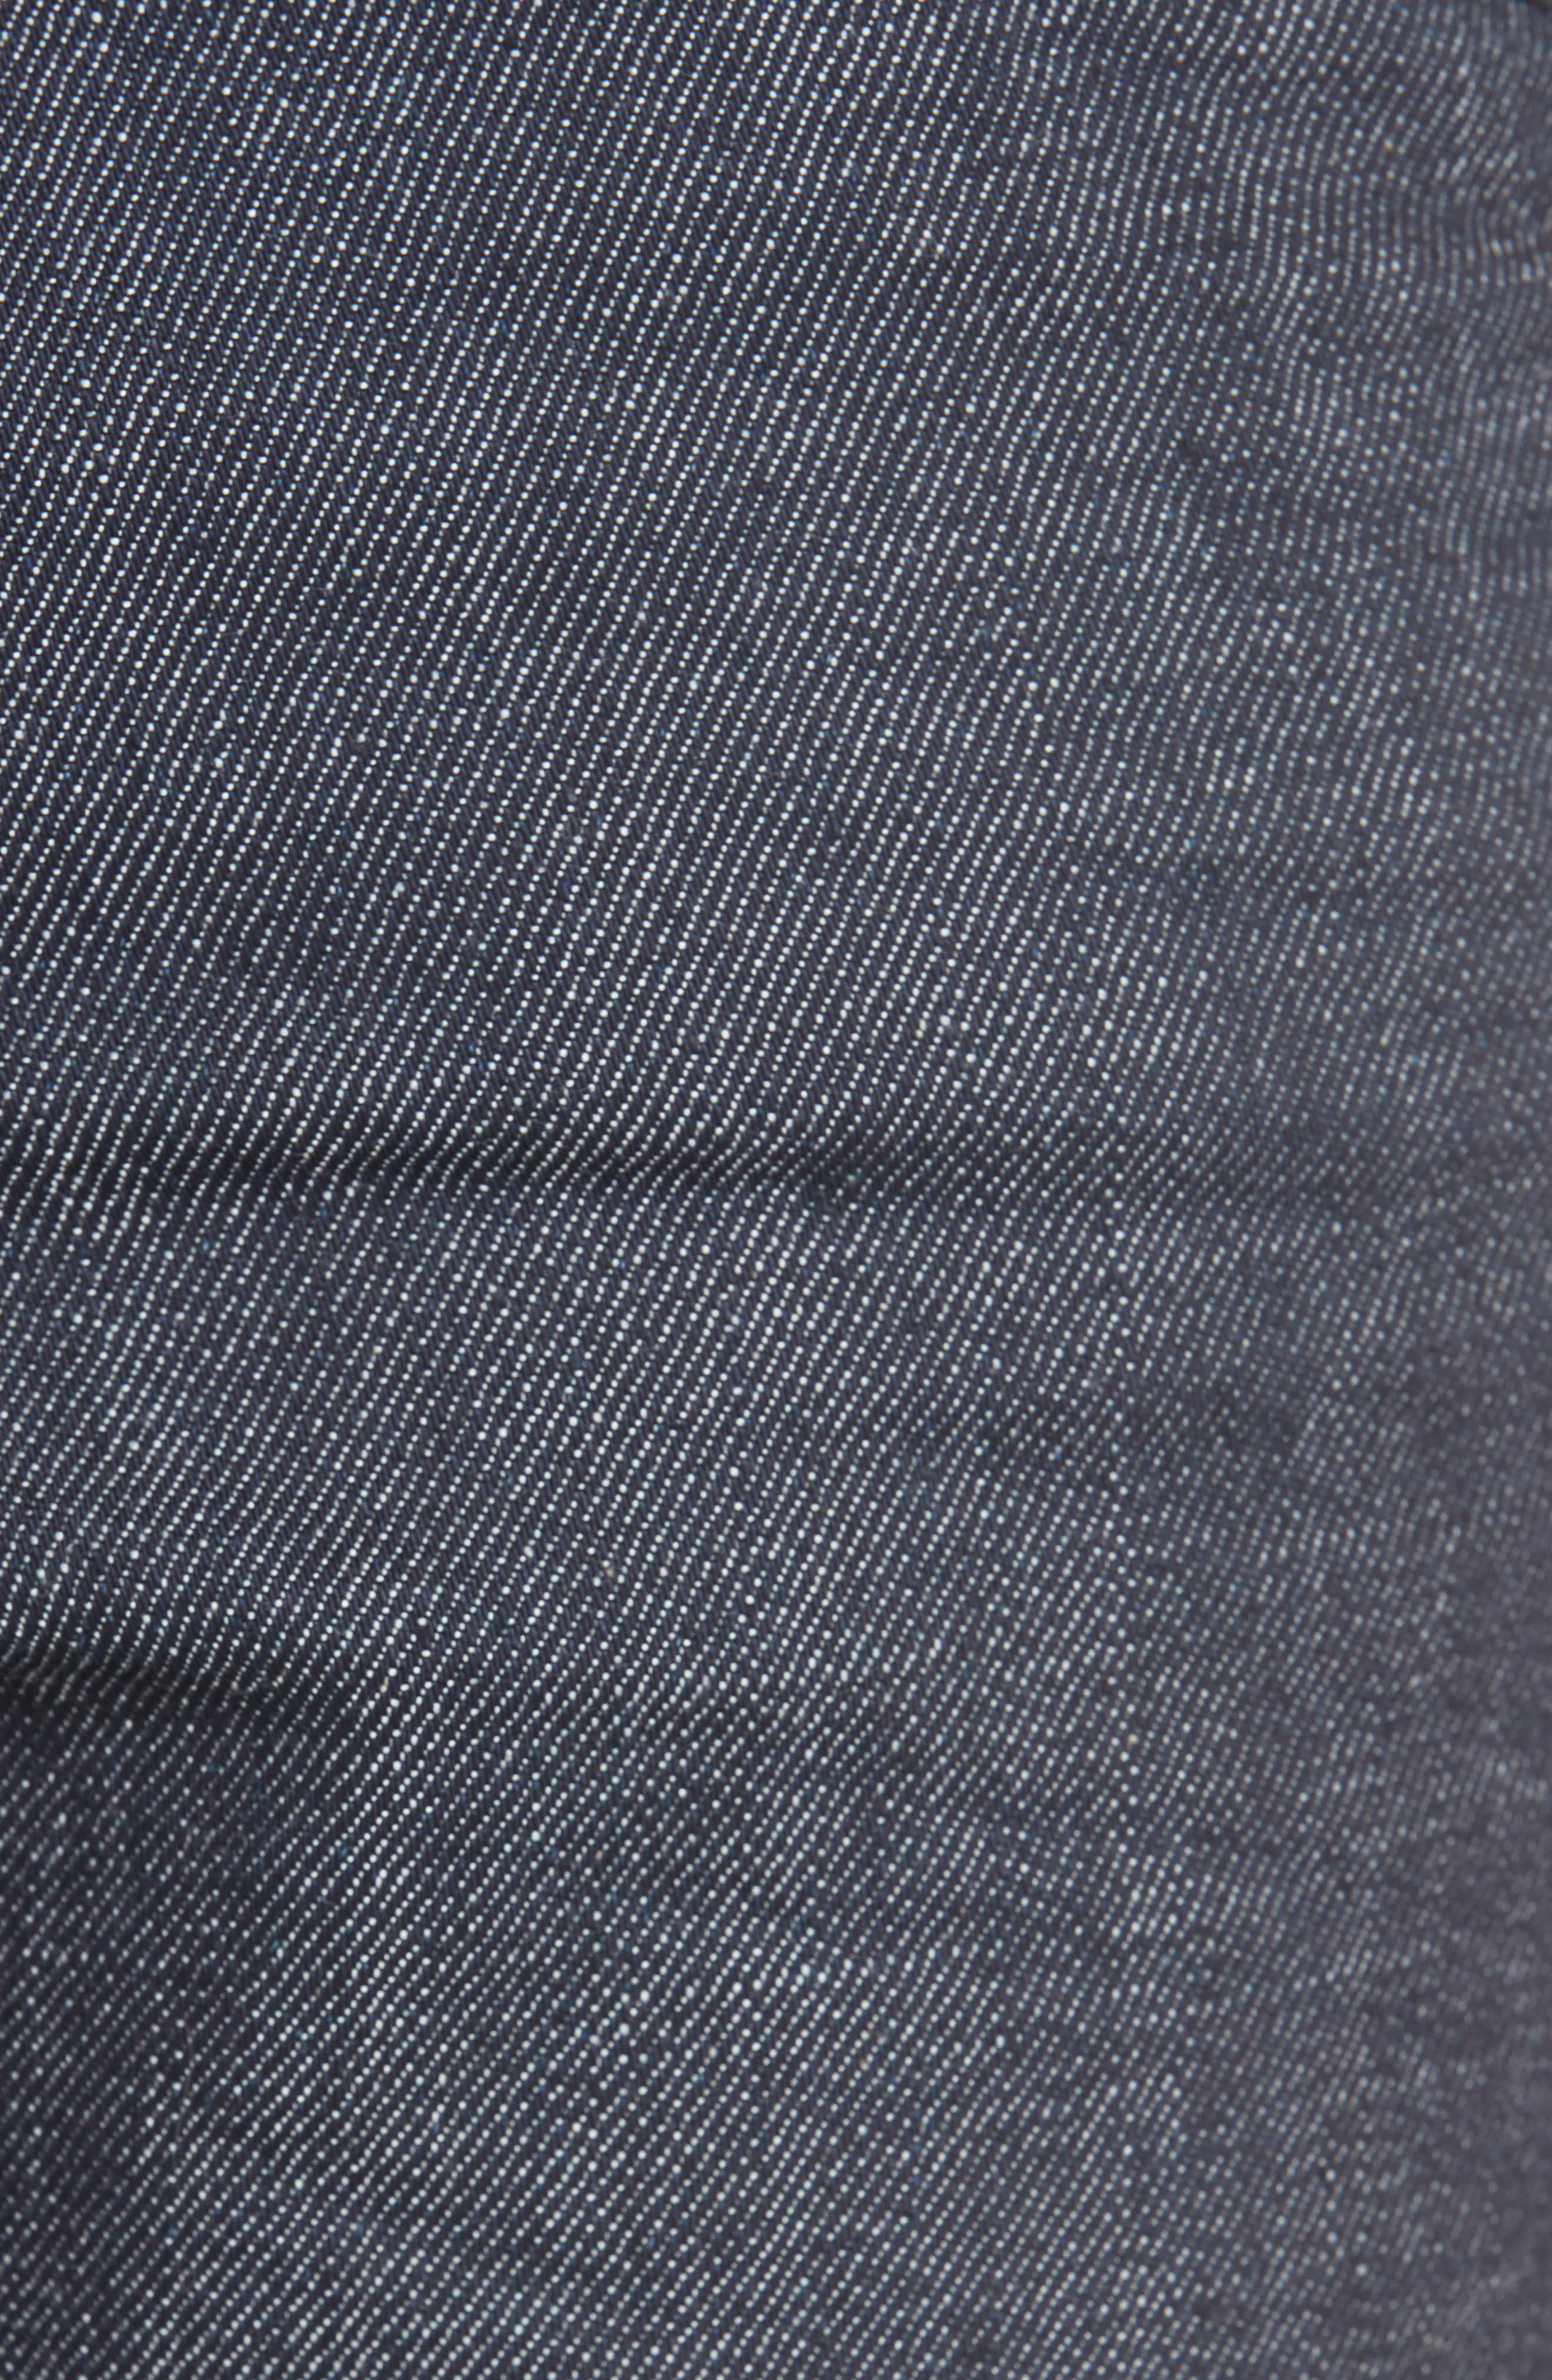 Cool Guy Jeans,                             Alternate thumbnail 5, color,                             DARK WASH